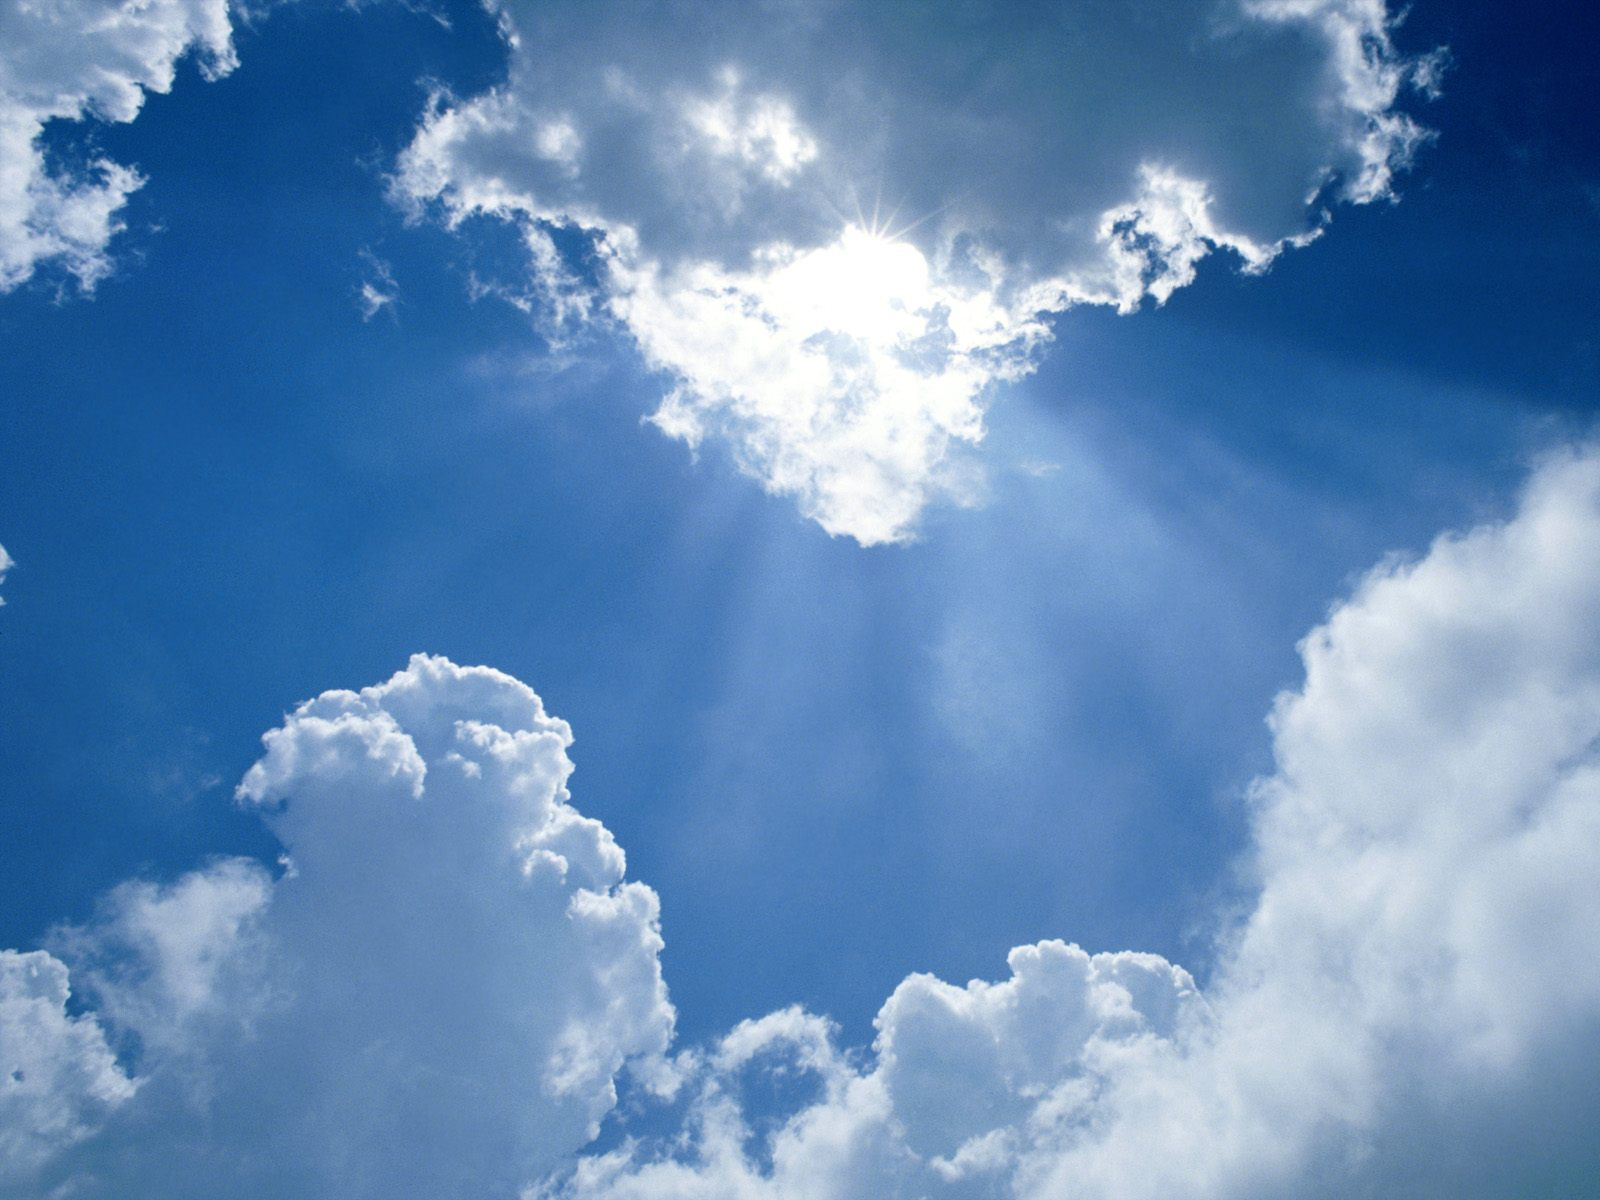 http://4.bp.blogspot.com/-40xRydwXh-k/TeaMVcJ6vuI/AAAAAAAABHw/YcIkkhpbm4g/s1600/nature-wallpaper-heaven-s-rays.jpg